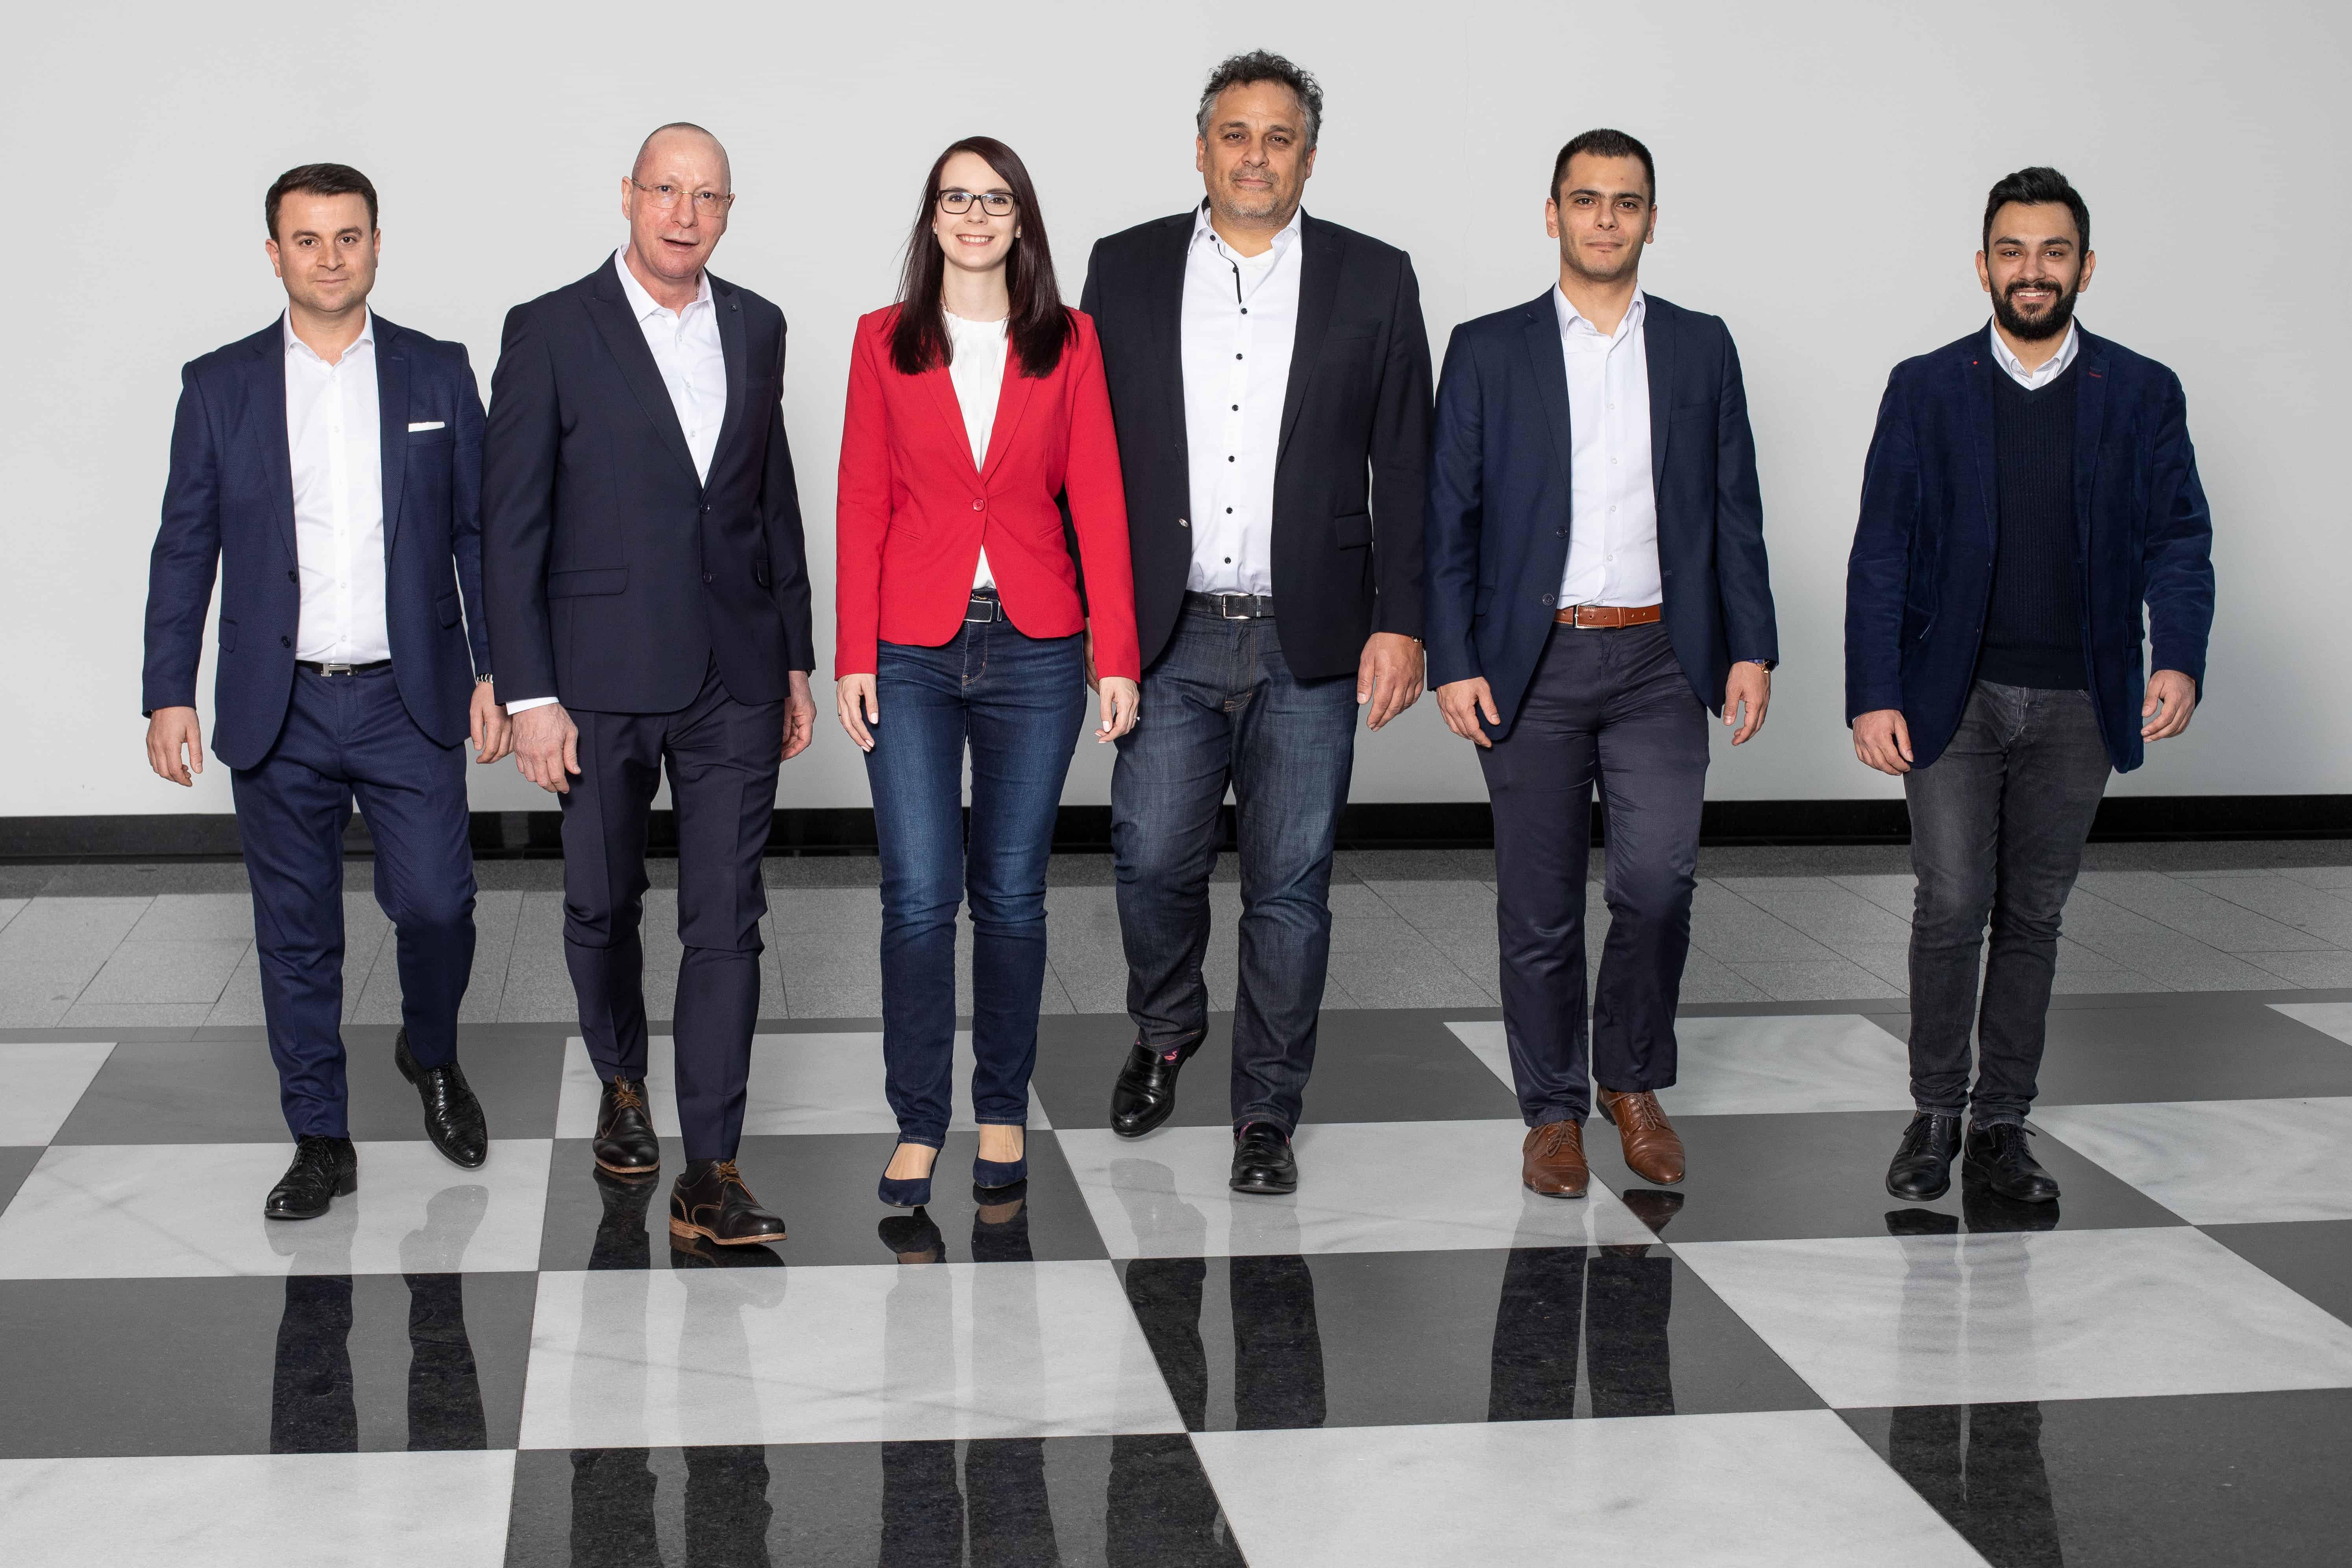 SPD Wahlkampfteam